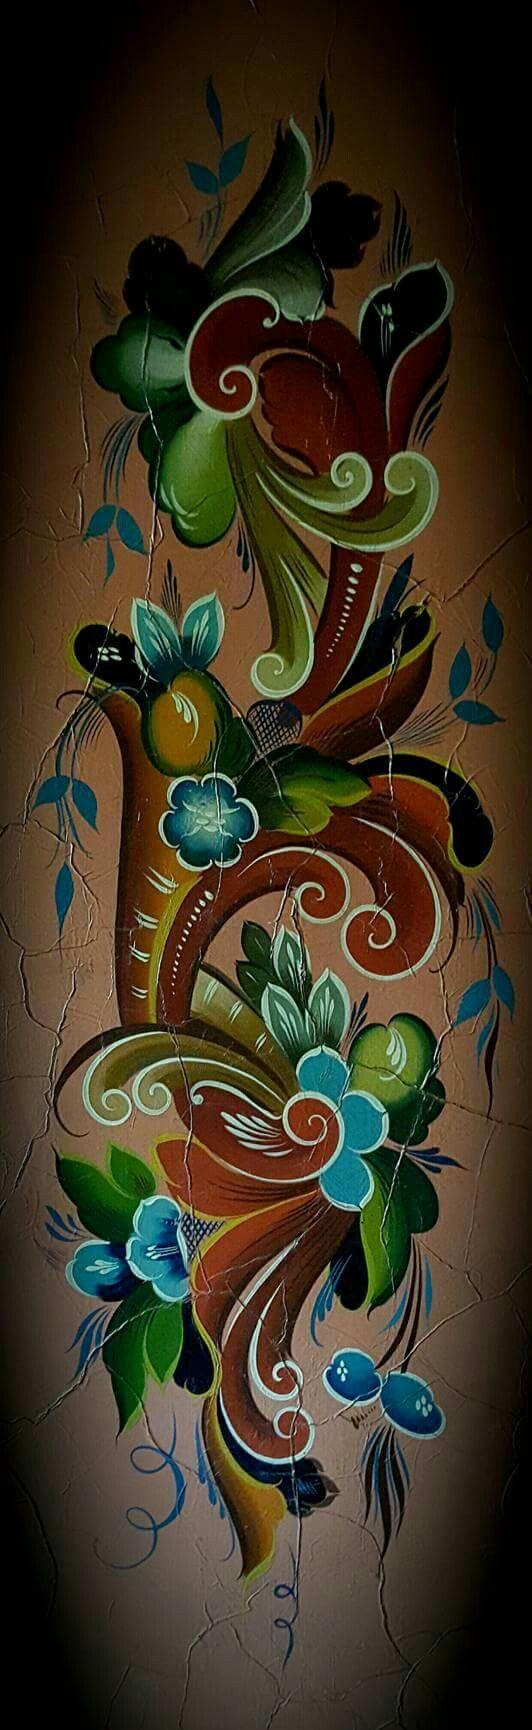 Tattoos arabesque tattoos arabeske tattoos arabesk tattoos - John H Tj Nn 1931 Norwegian Artrosemaling Patternnorwegian Rosemalingkalocsaiscandinavian Kitchentole Paintingtattoo